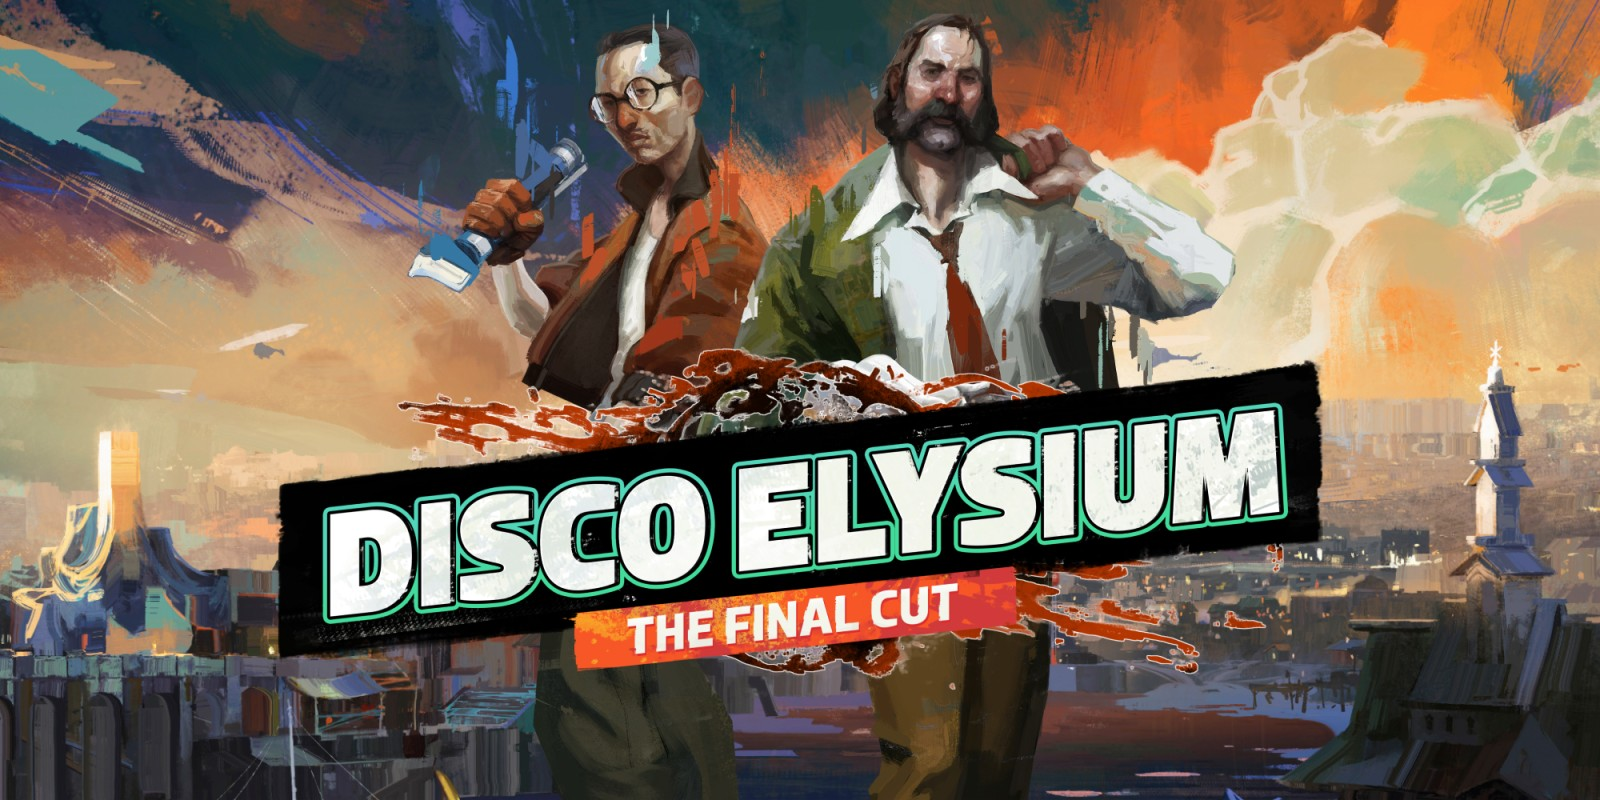 Disco Elysium - The Final Cut Free Download